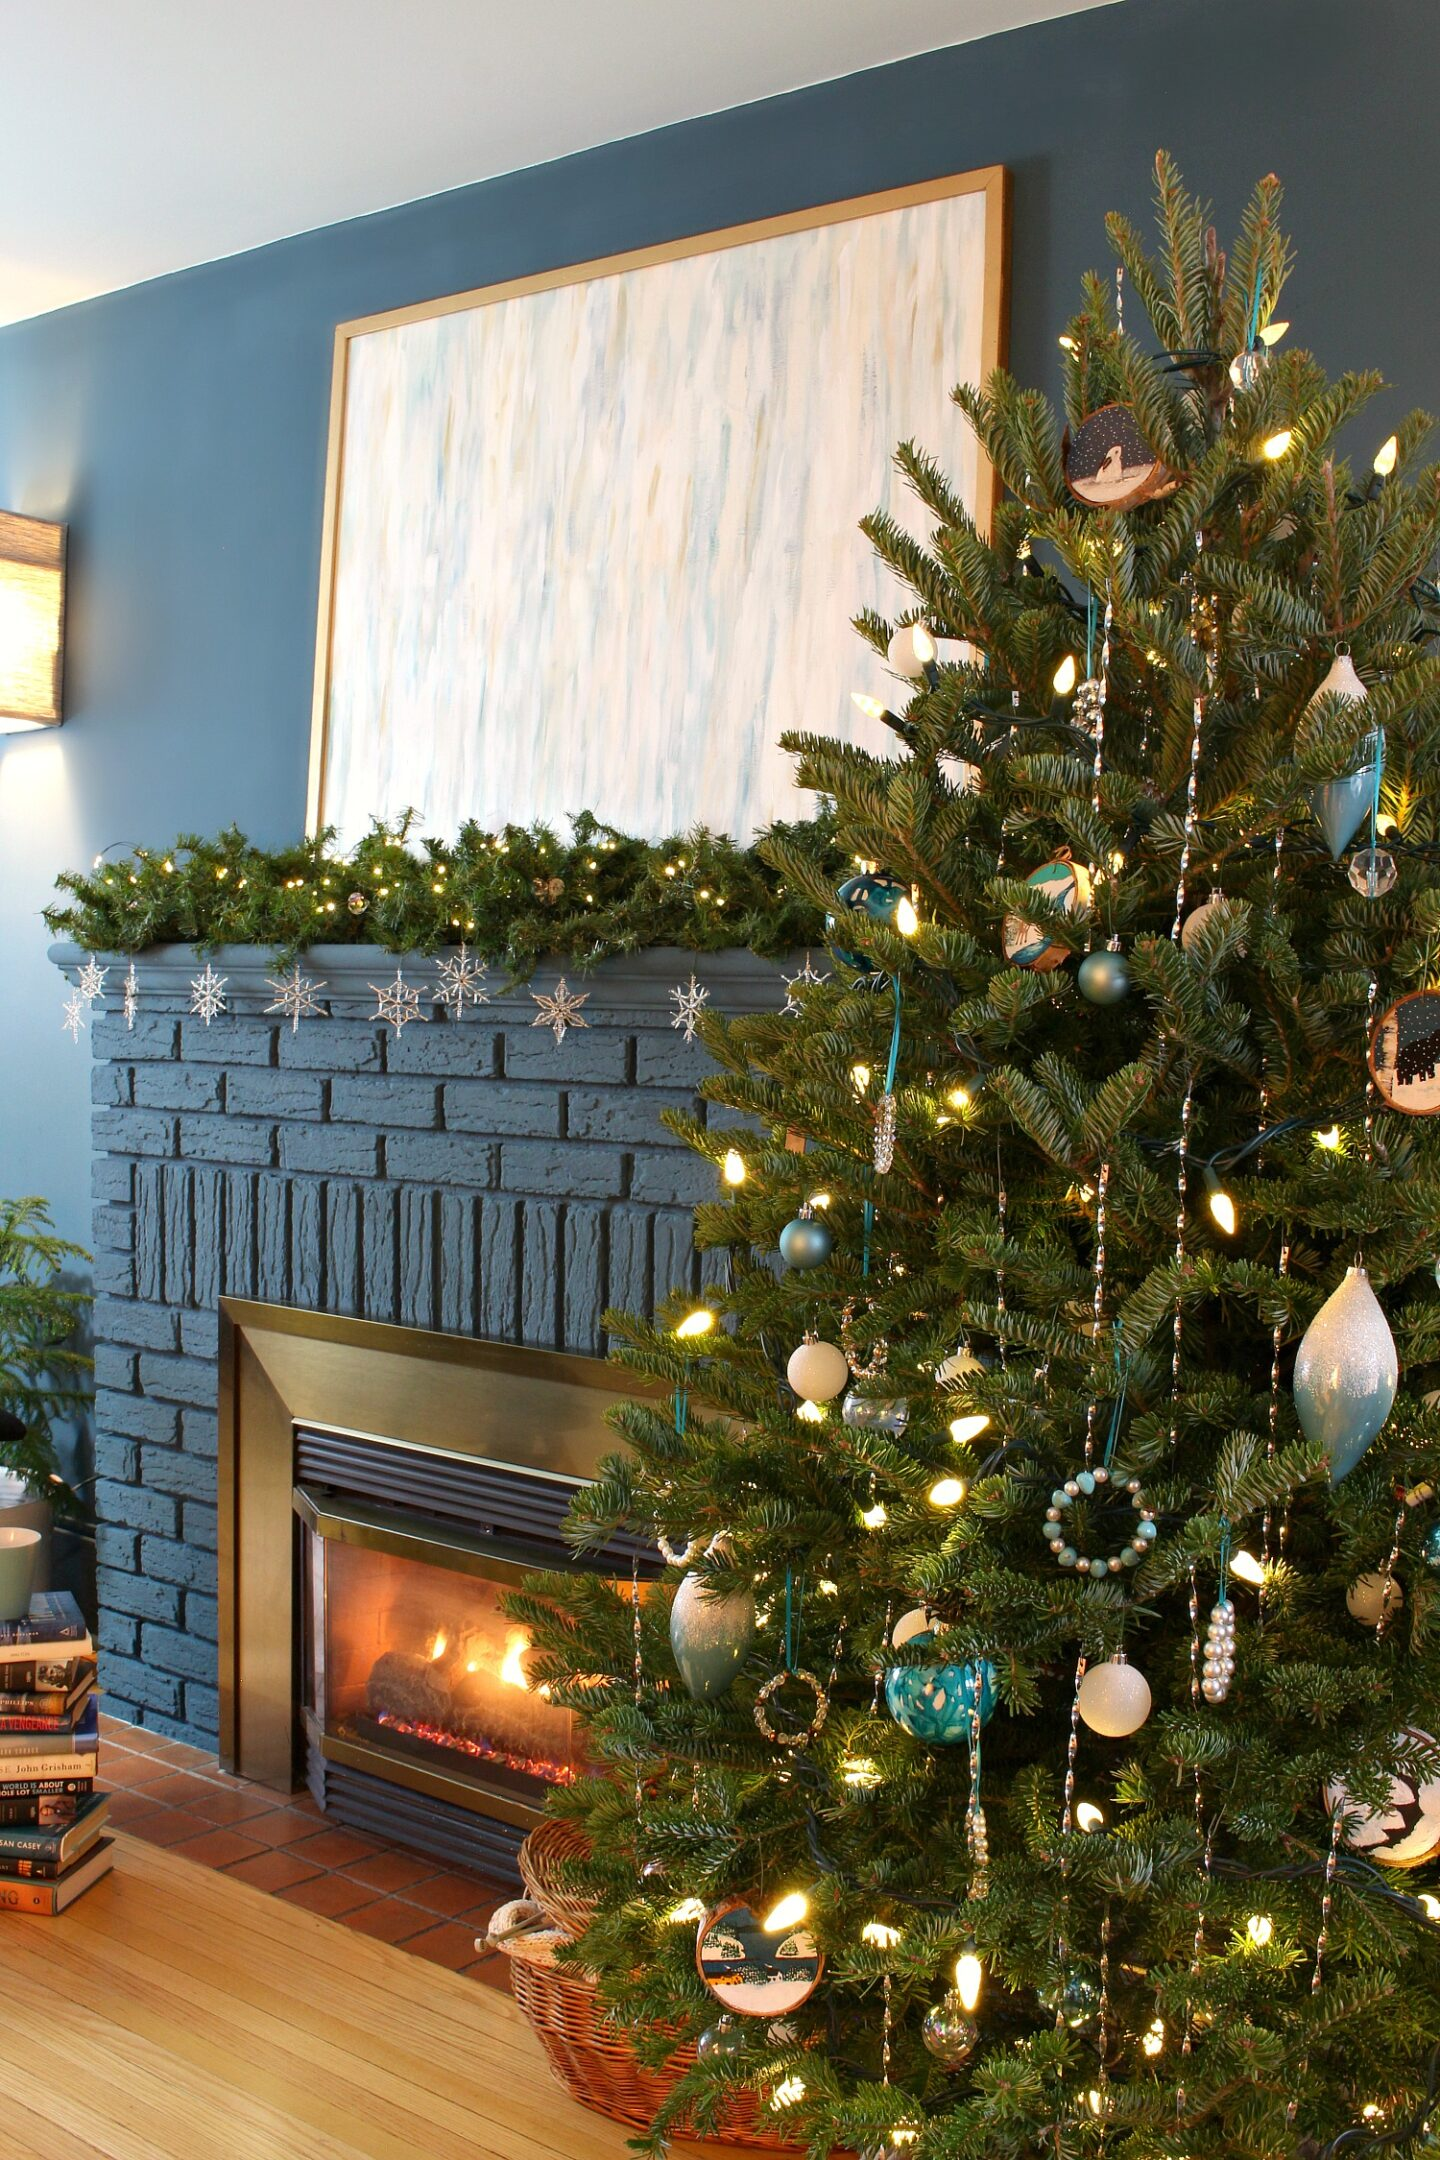 Blue and White Christmas Tree Decor